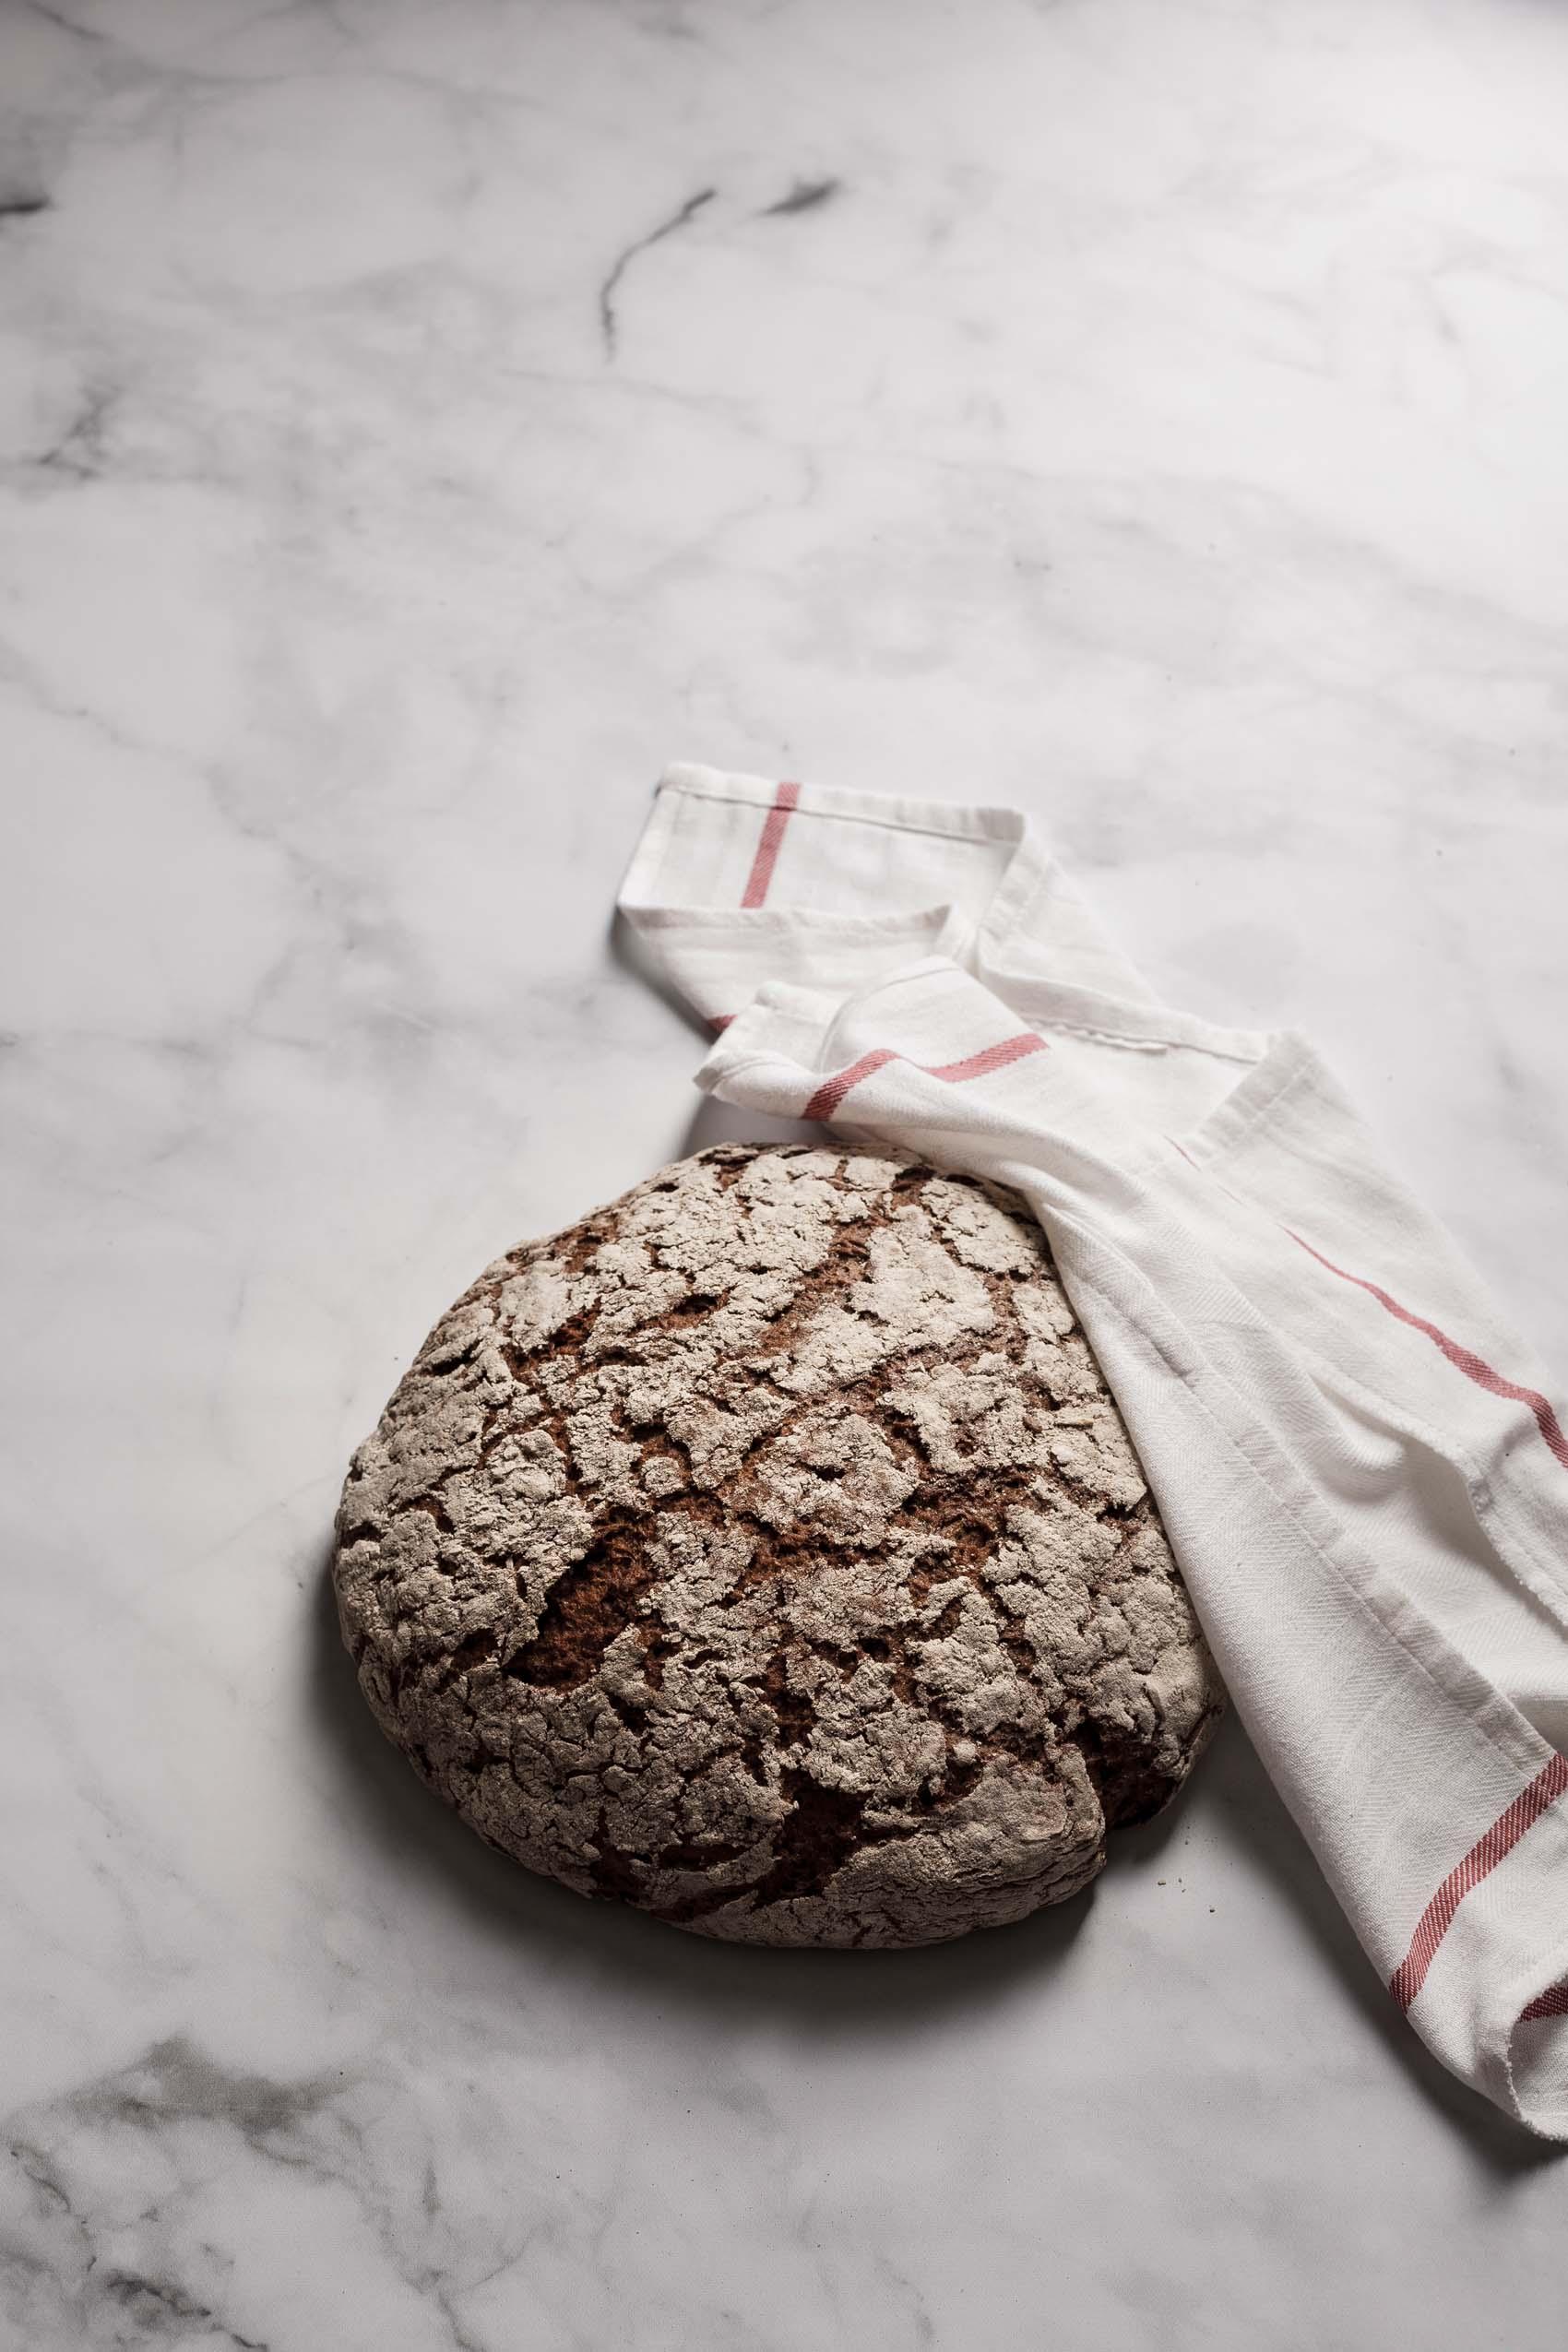 Uriges Brot aus der Brommler-Backstube